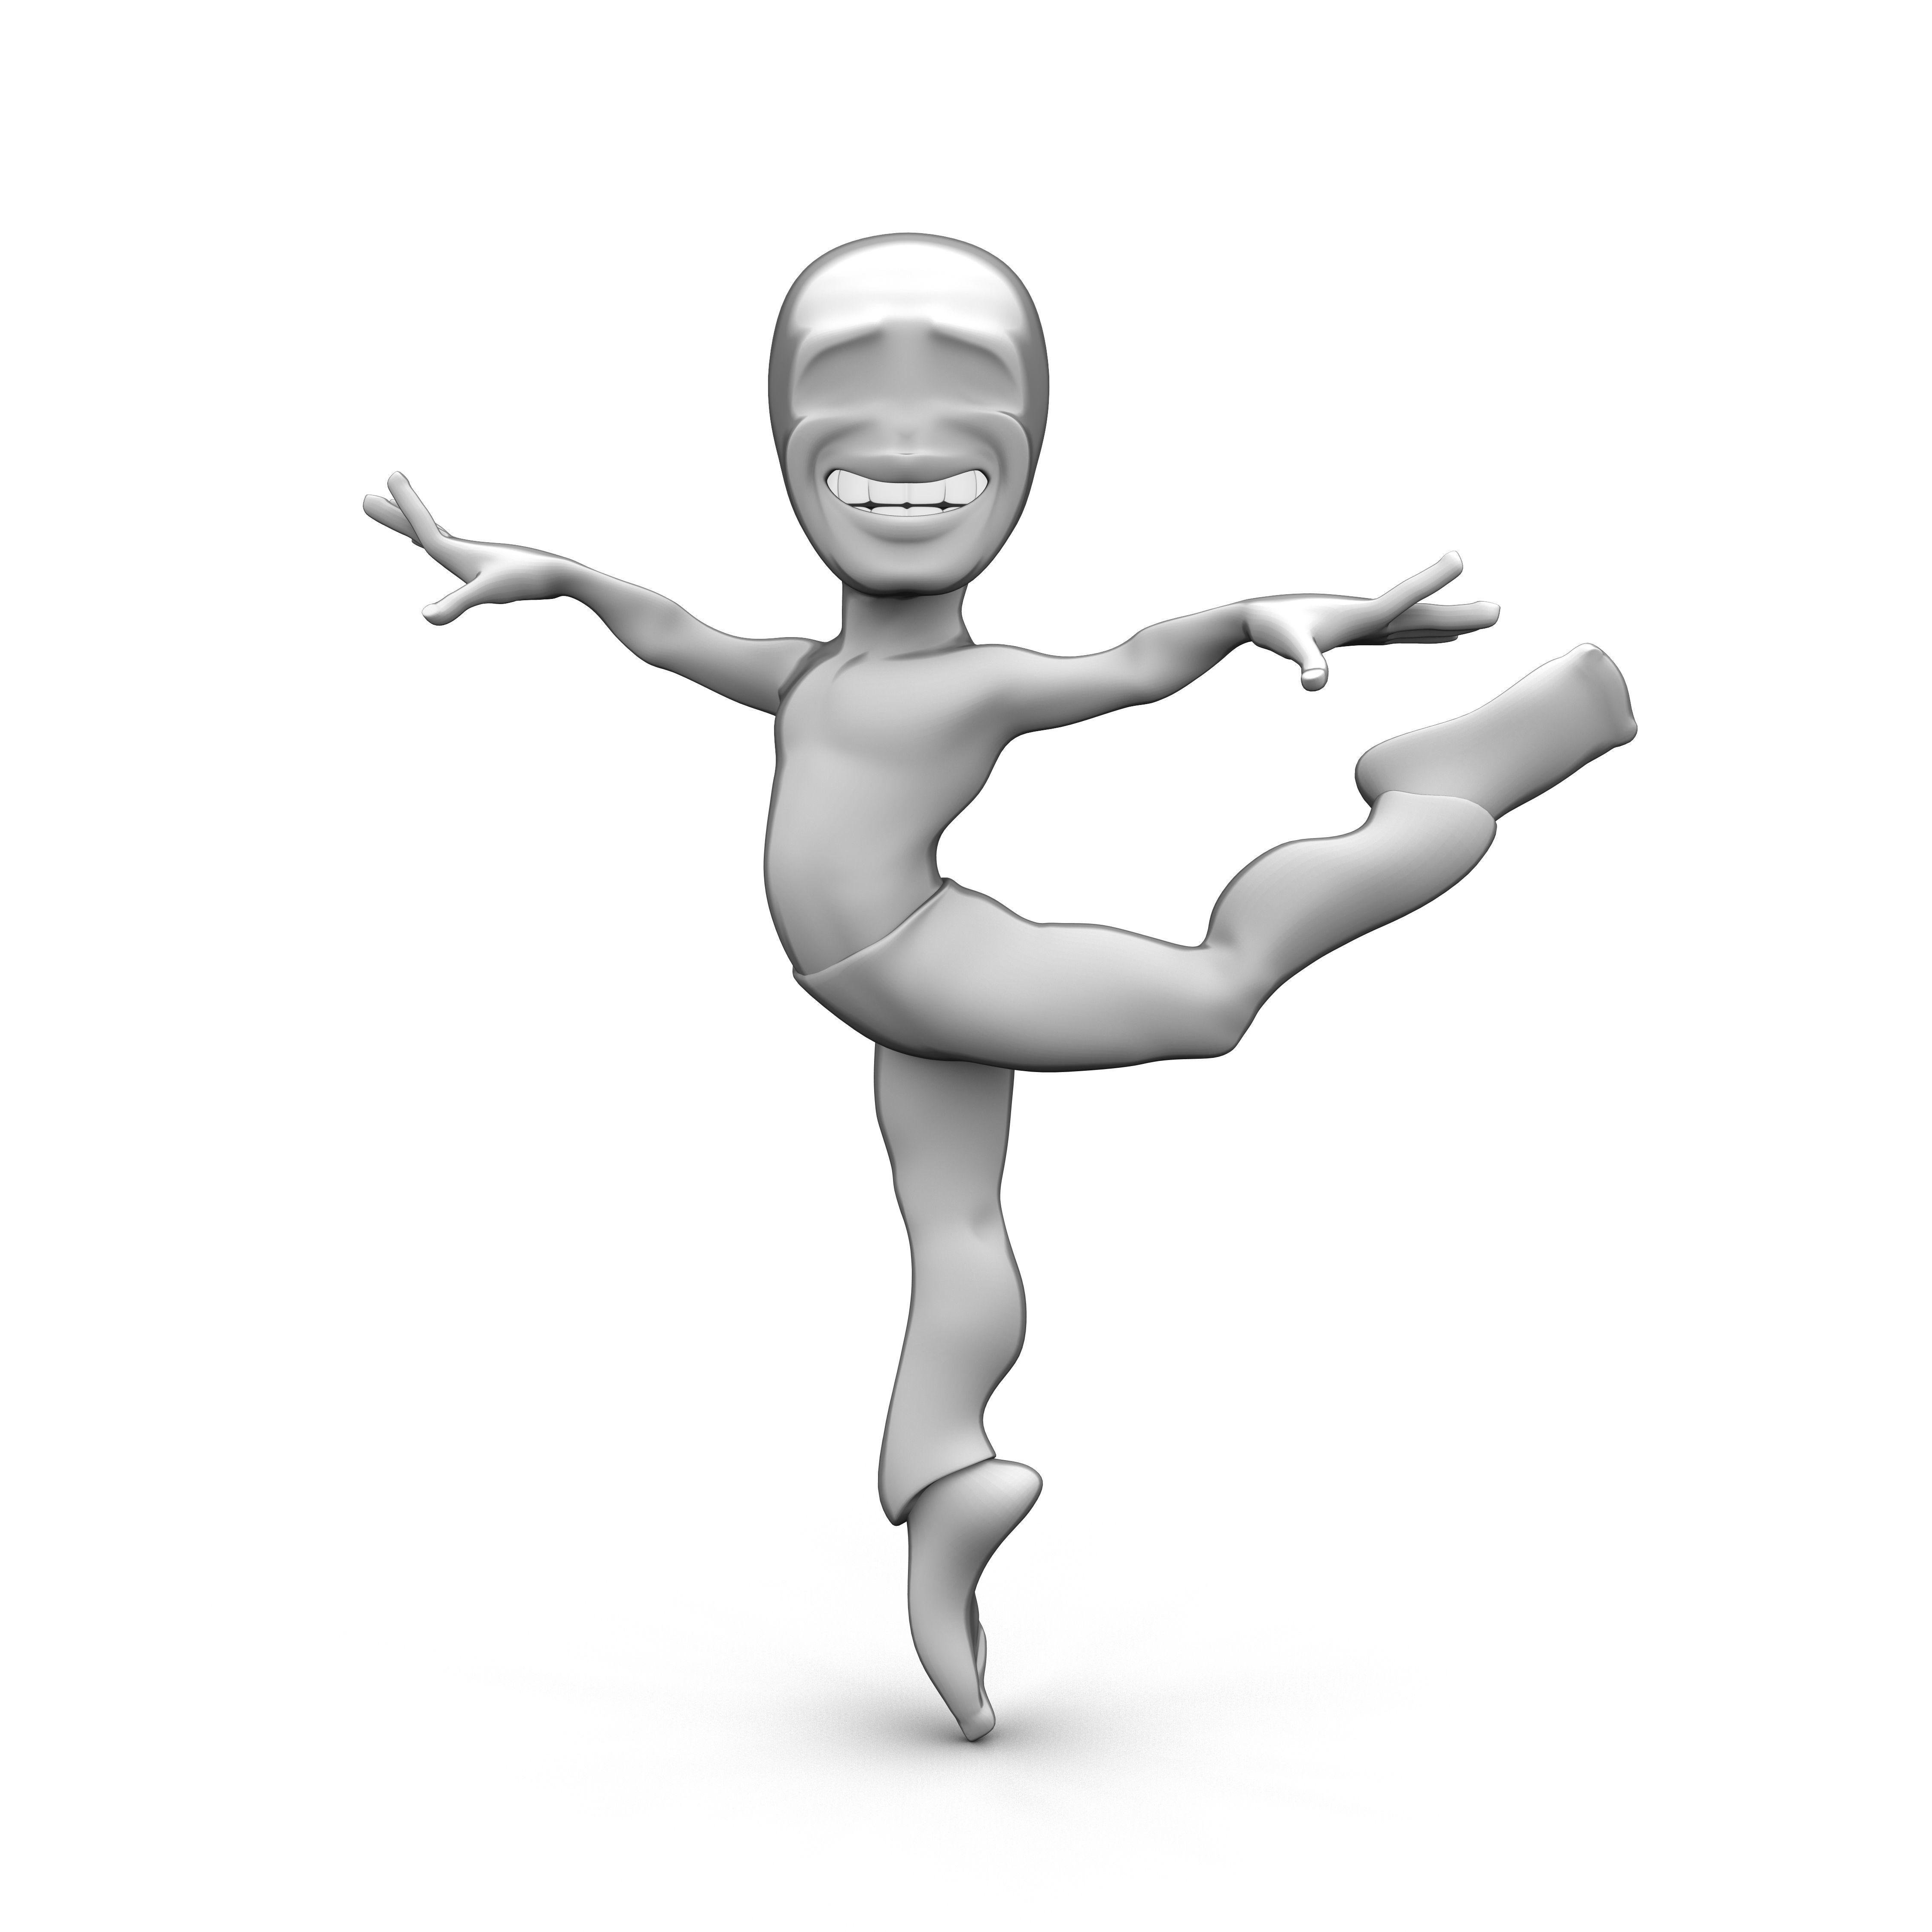 Abstract dancing character